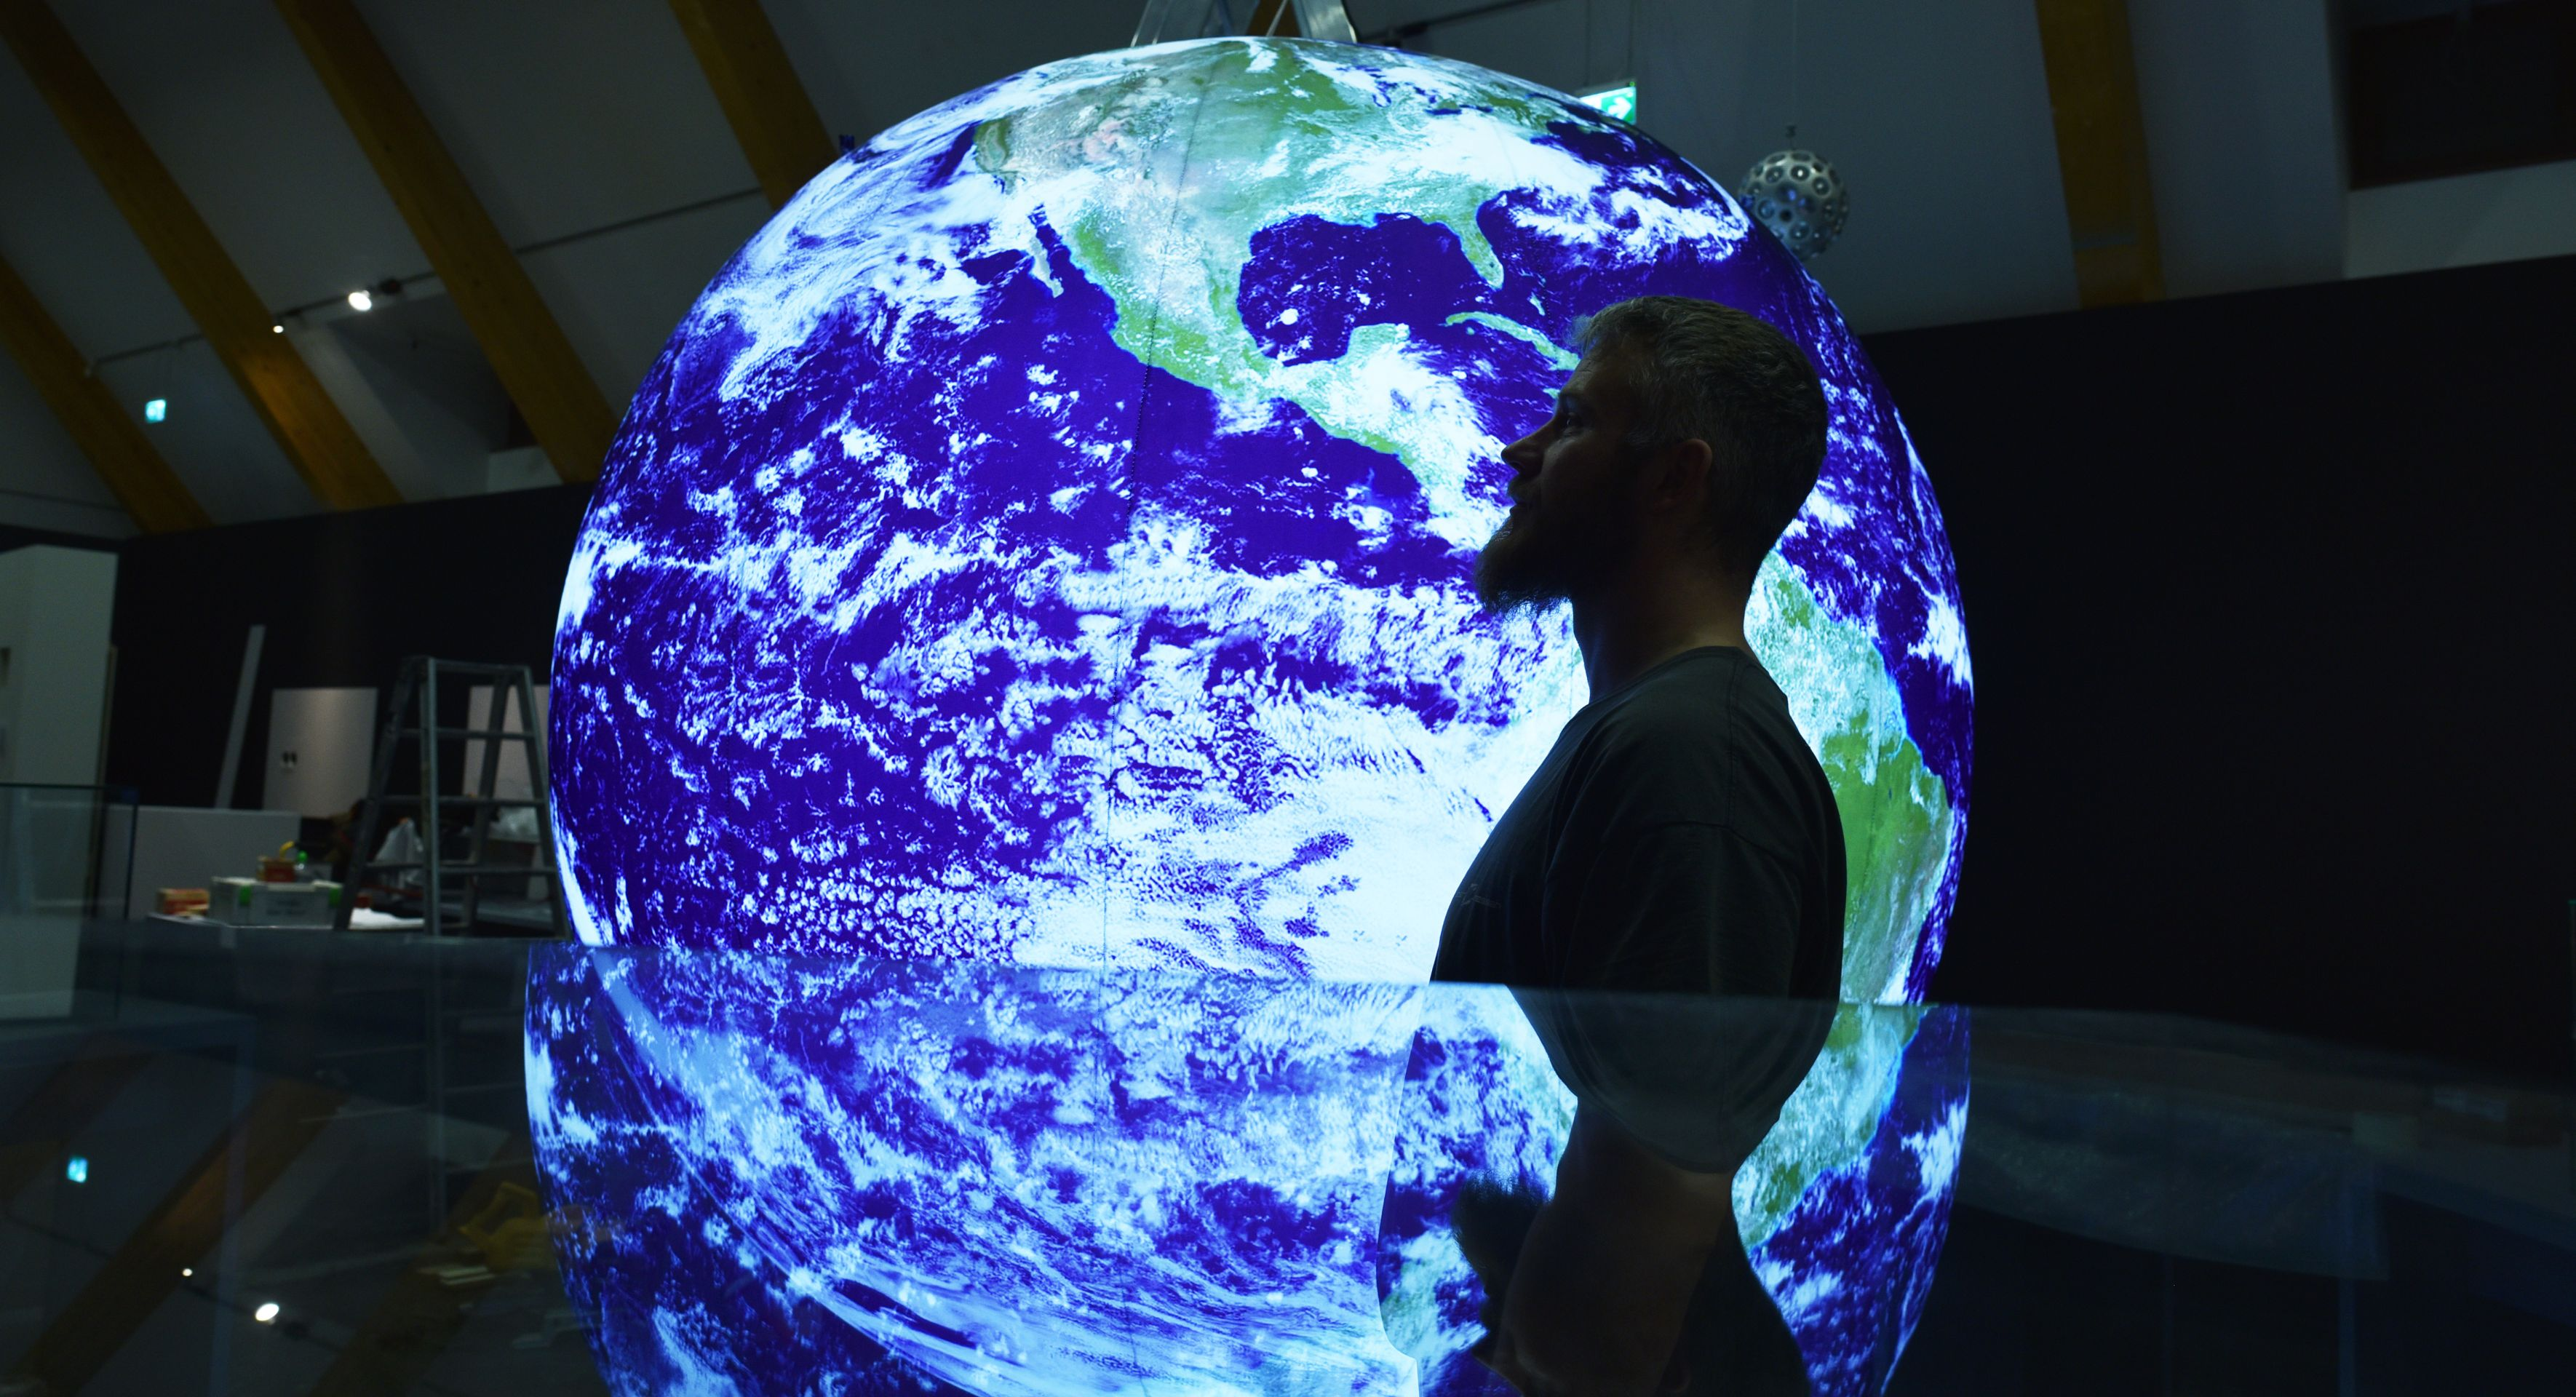 Dan planeta Zemlje, 22. travnja